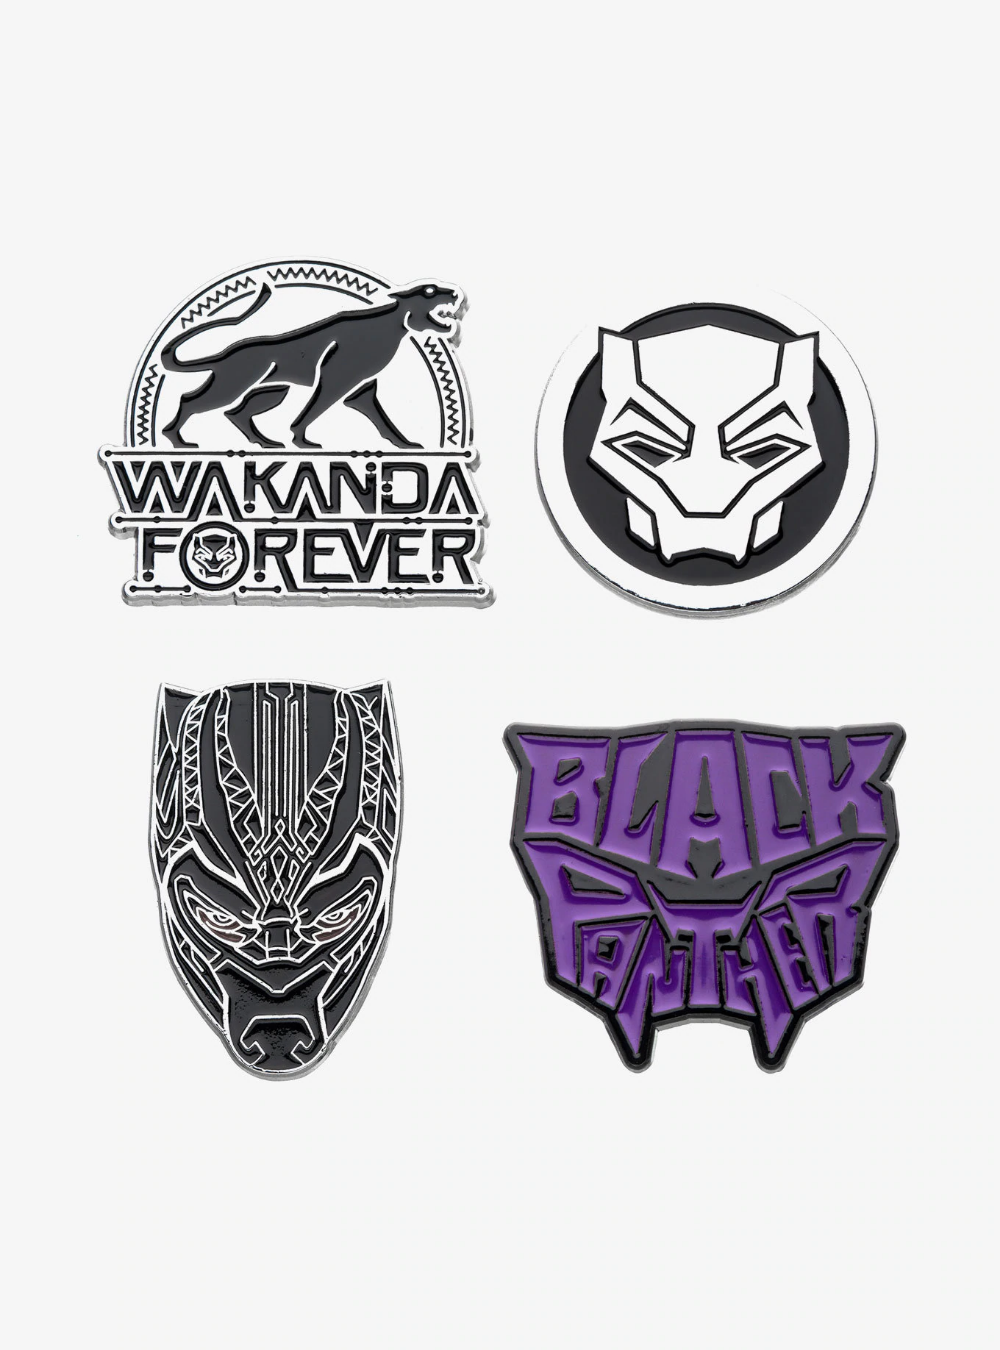 Marvel Black Panther Wakanda Forever Enamel Pin Set Black Panther Tattoo Black Panther Marvel Black Panther